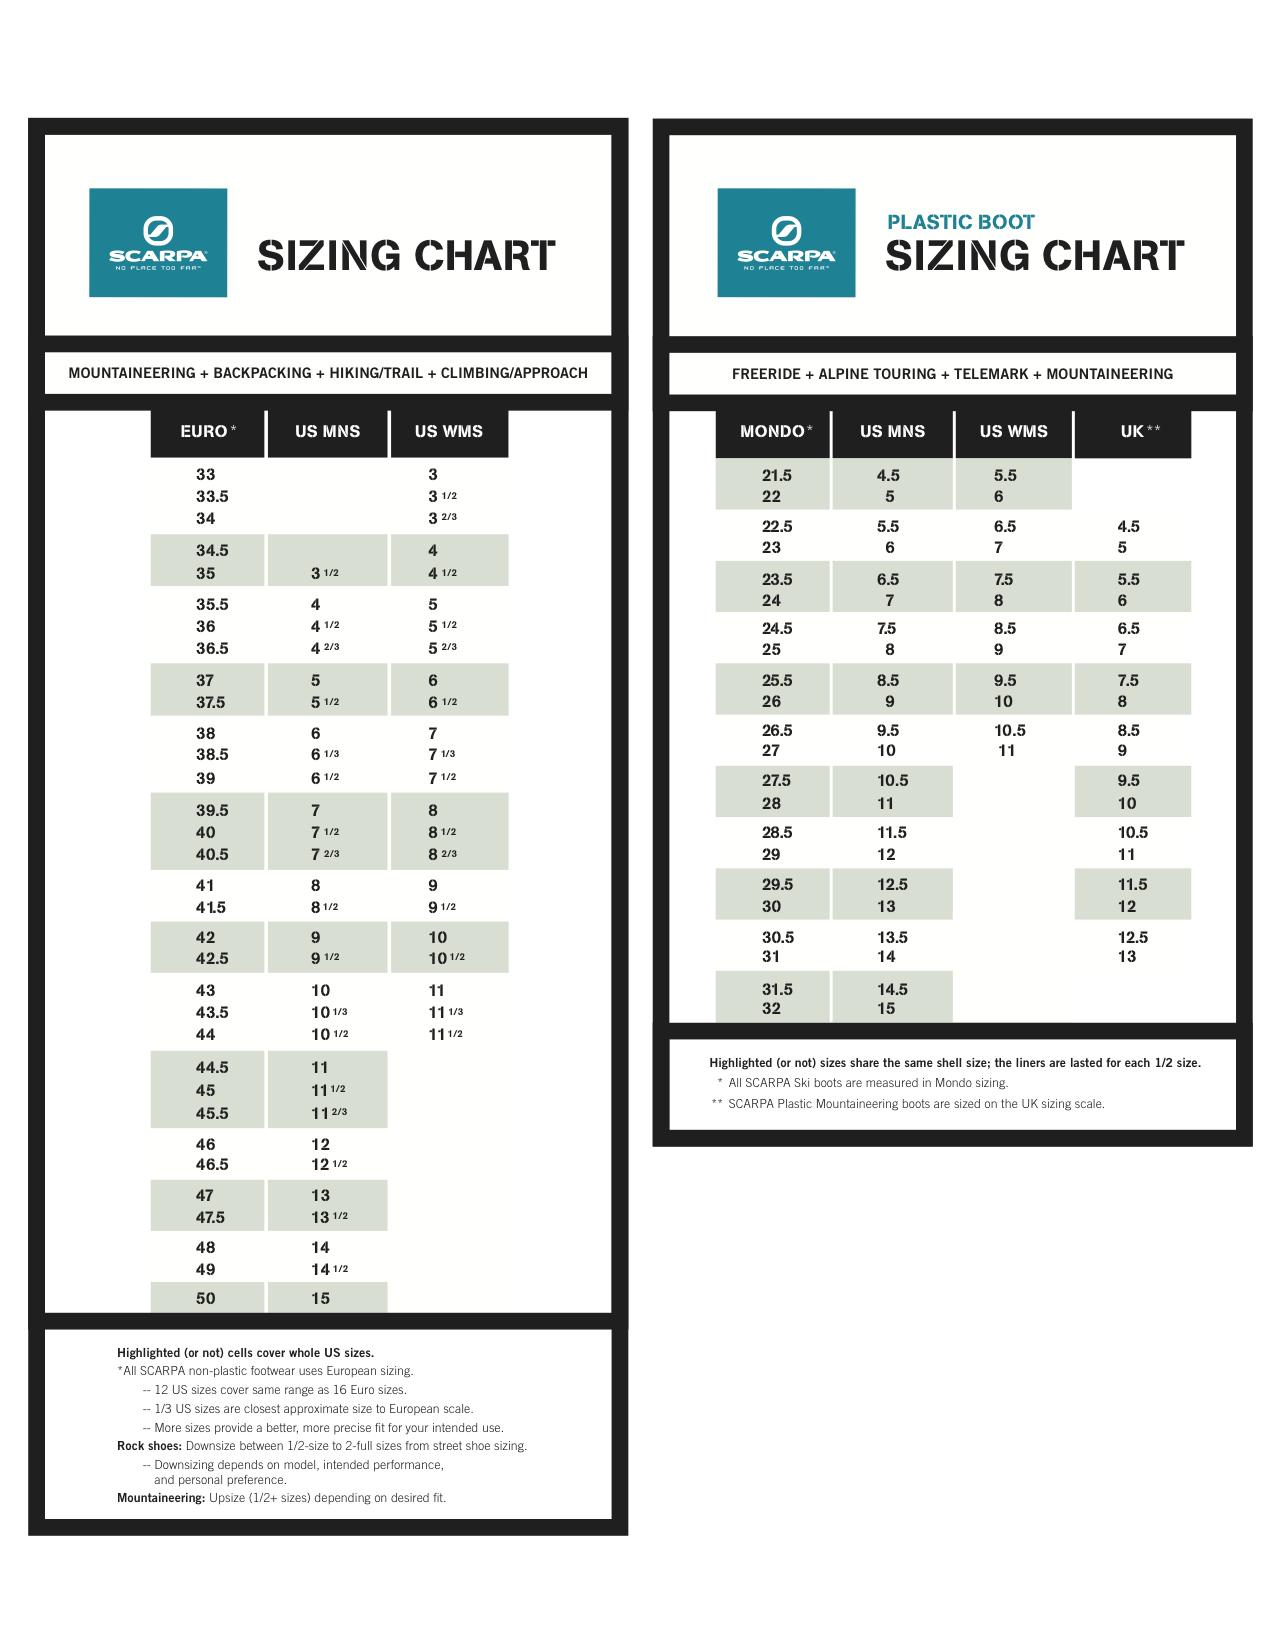 merrell size table pdf